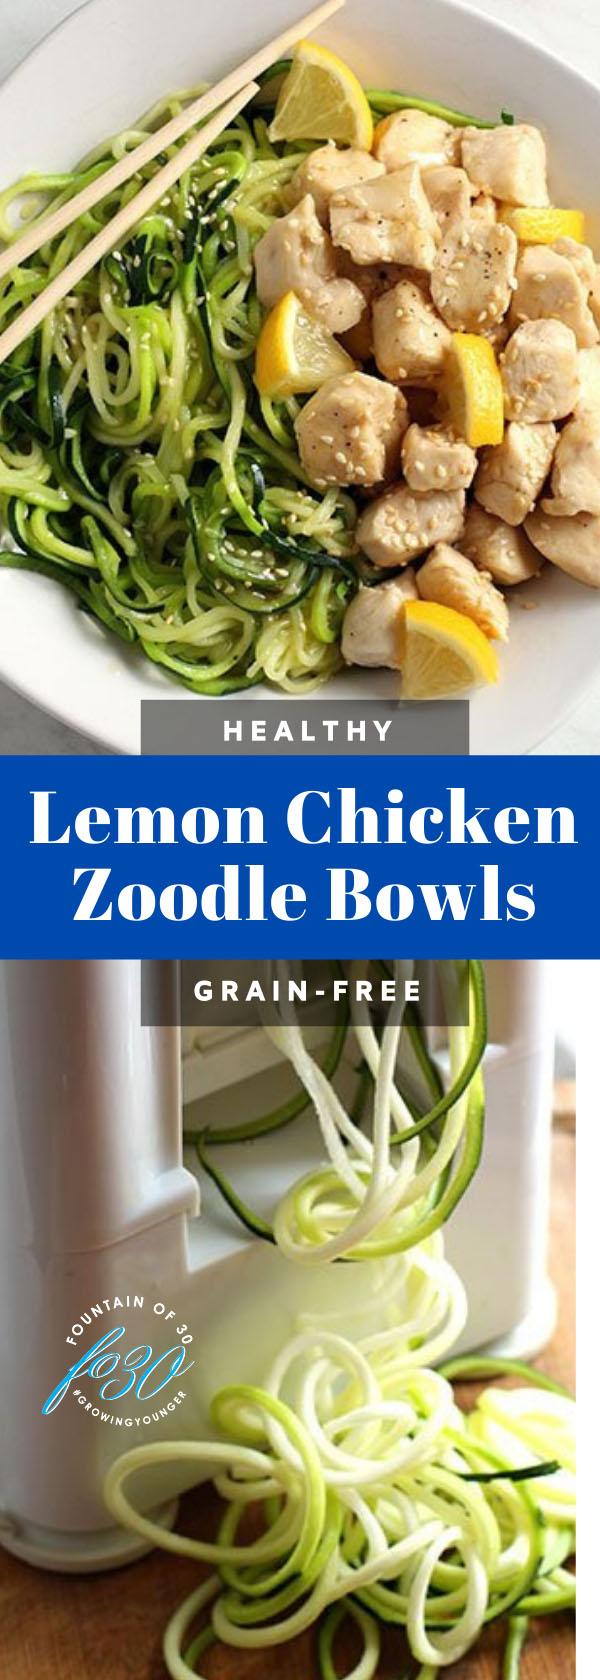 lemon chicken zoodles recipe fountainof30